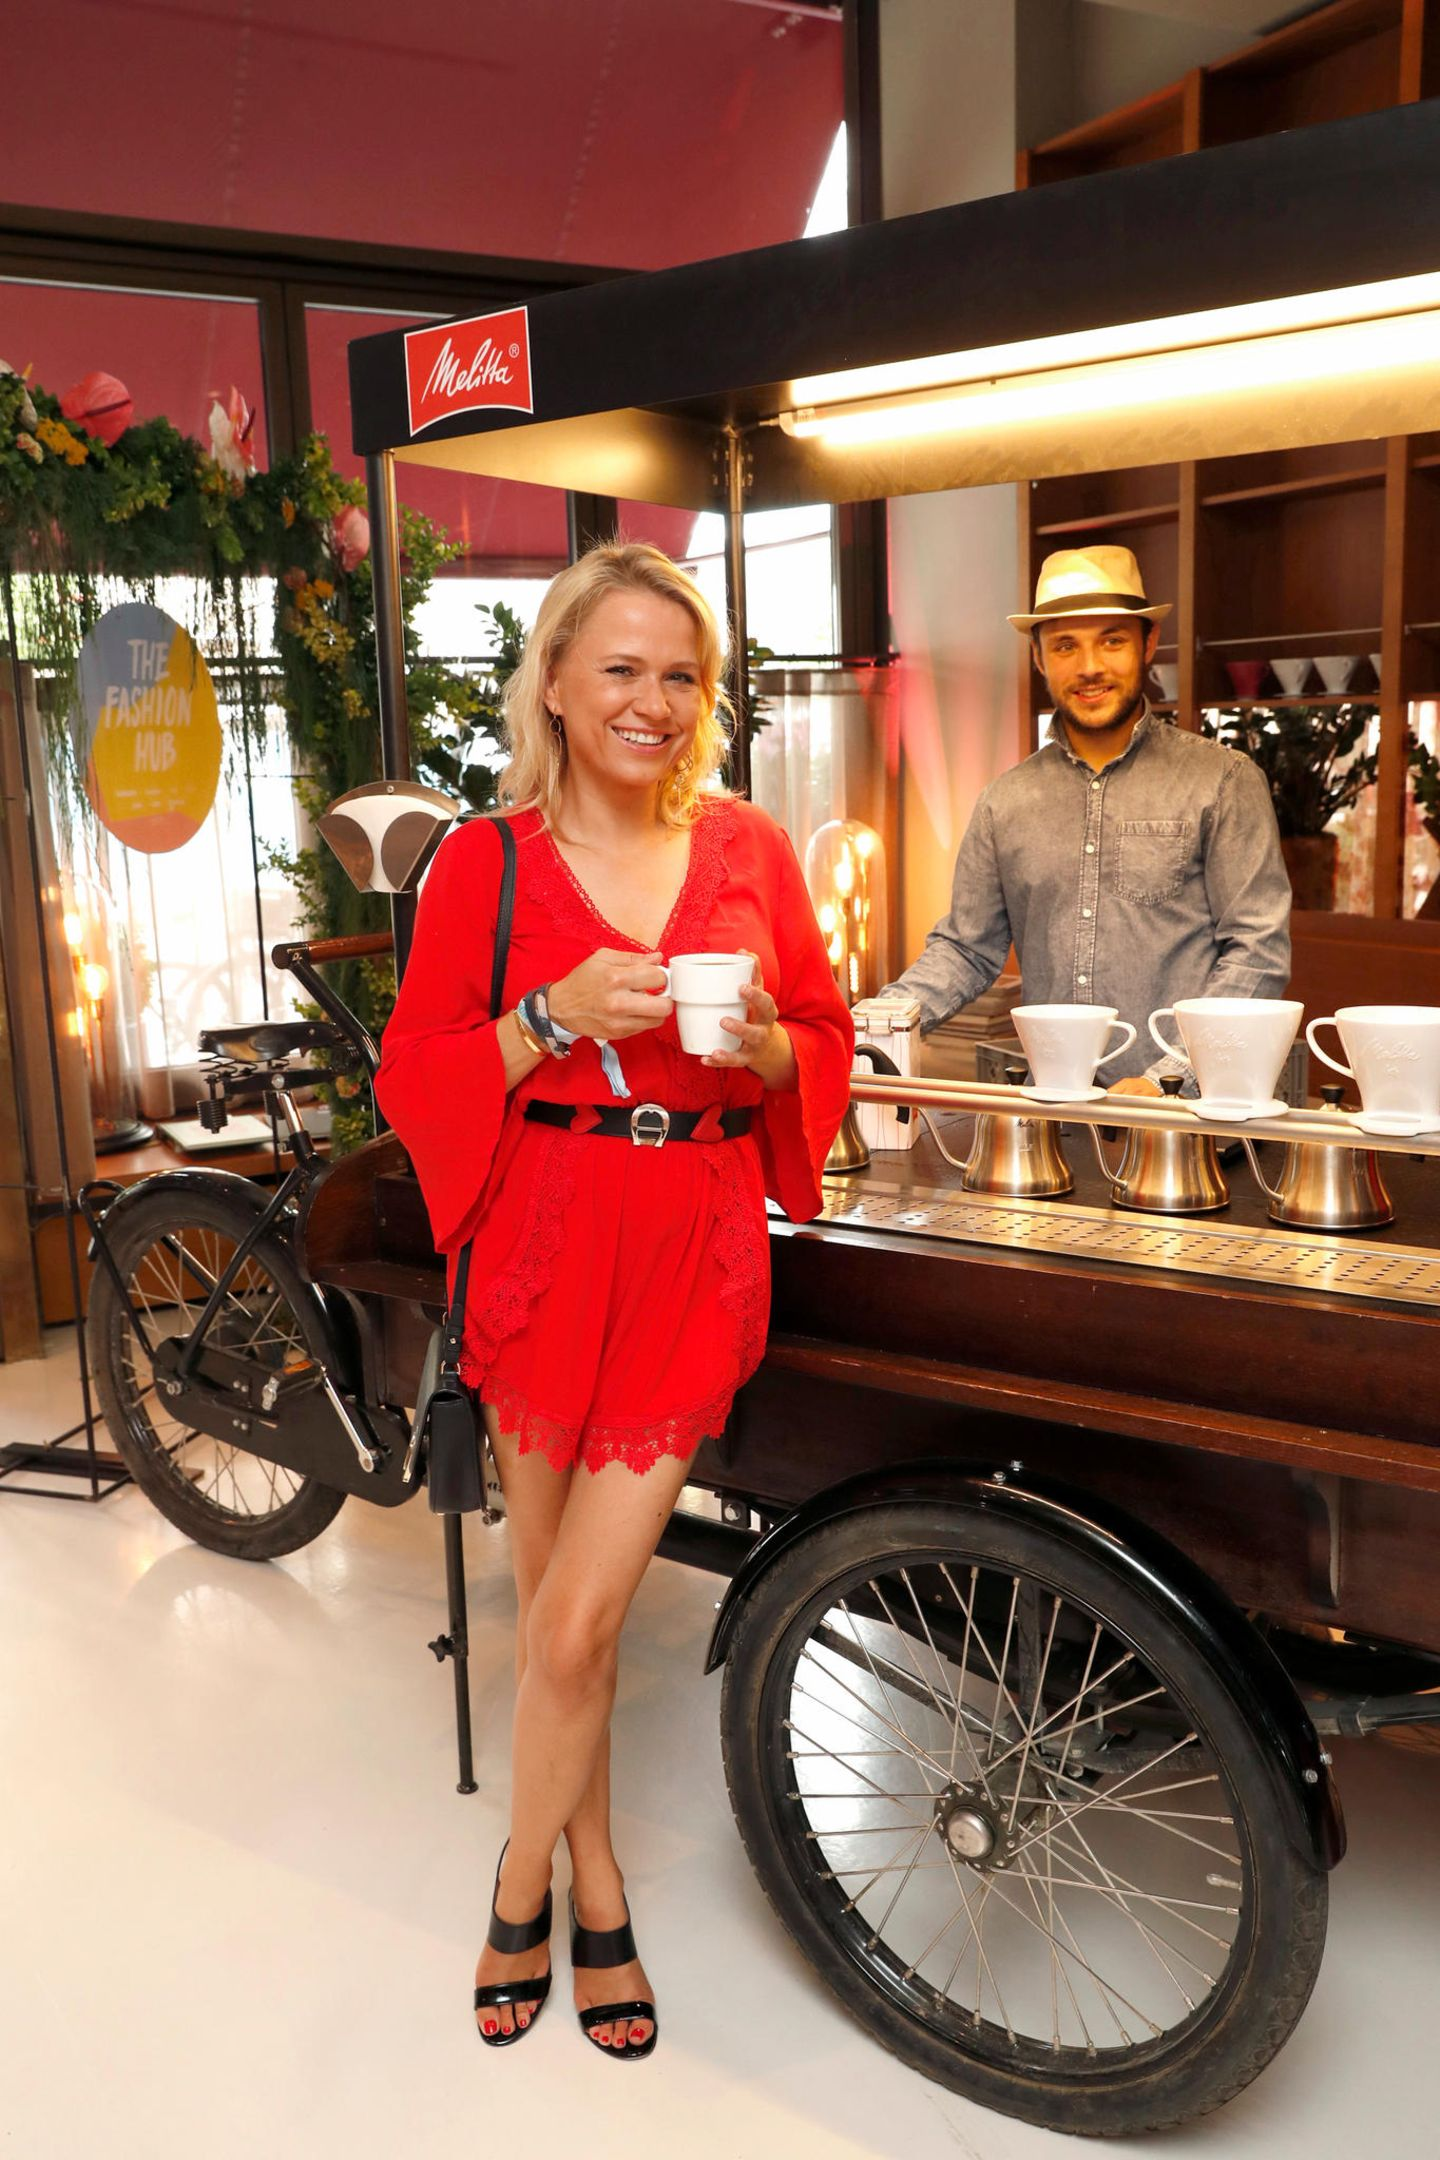 Eine kurze Kaffeepause legt Moderatorin Nova Meierhenrich am Melitta Coffee-Bike.